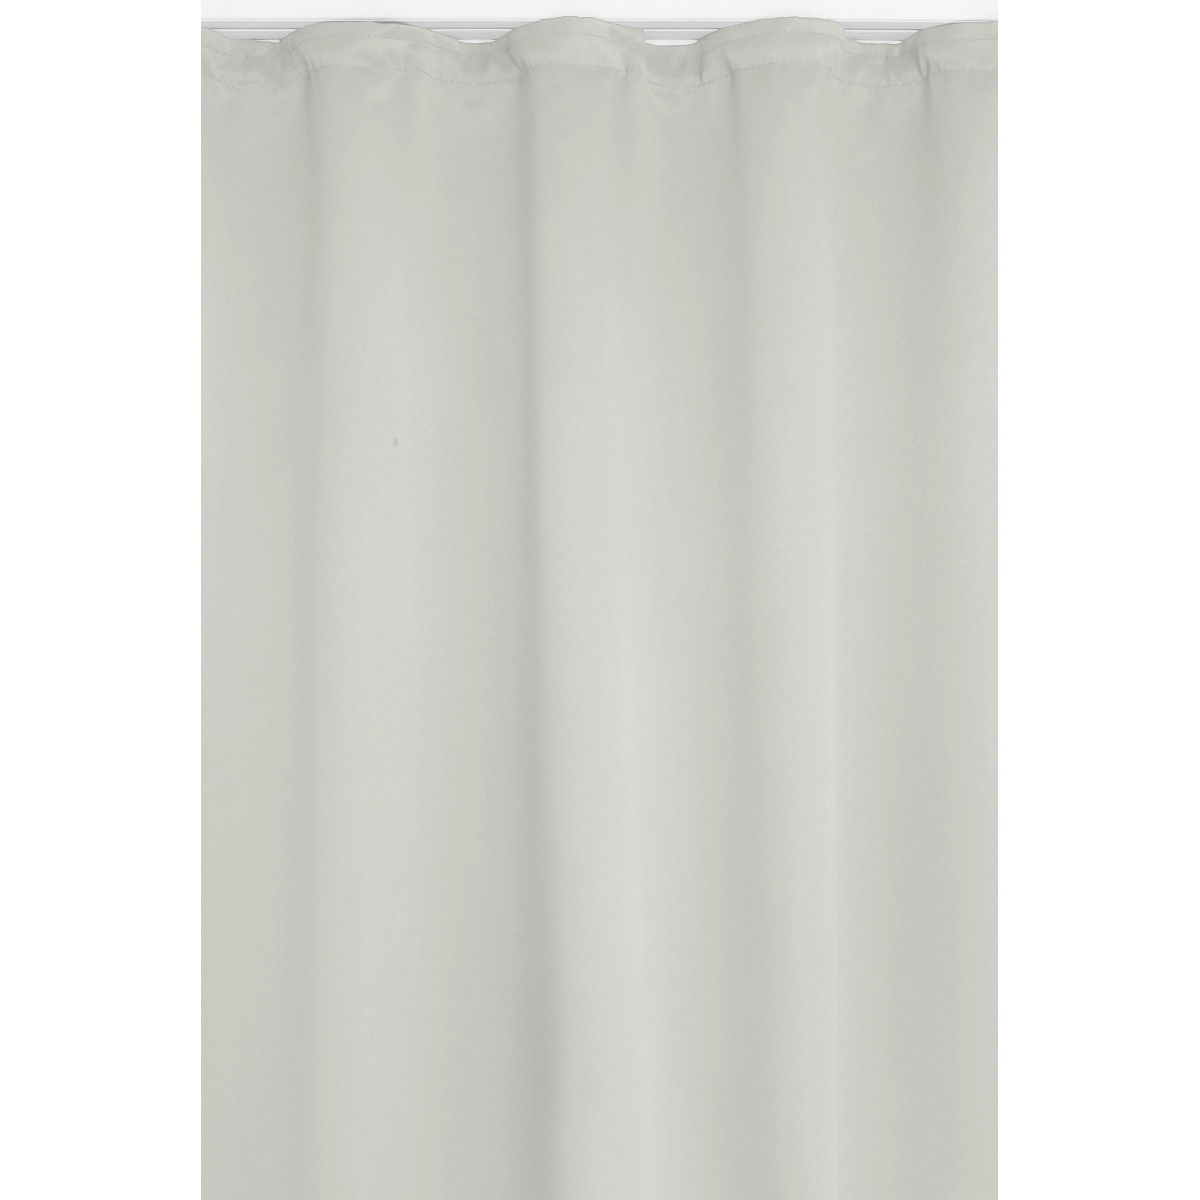 vorhang gardine blickdicht dekoschal kr uselband in weiss. Black Bedroom Furniture Sets. Home Design Ideas